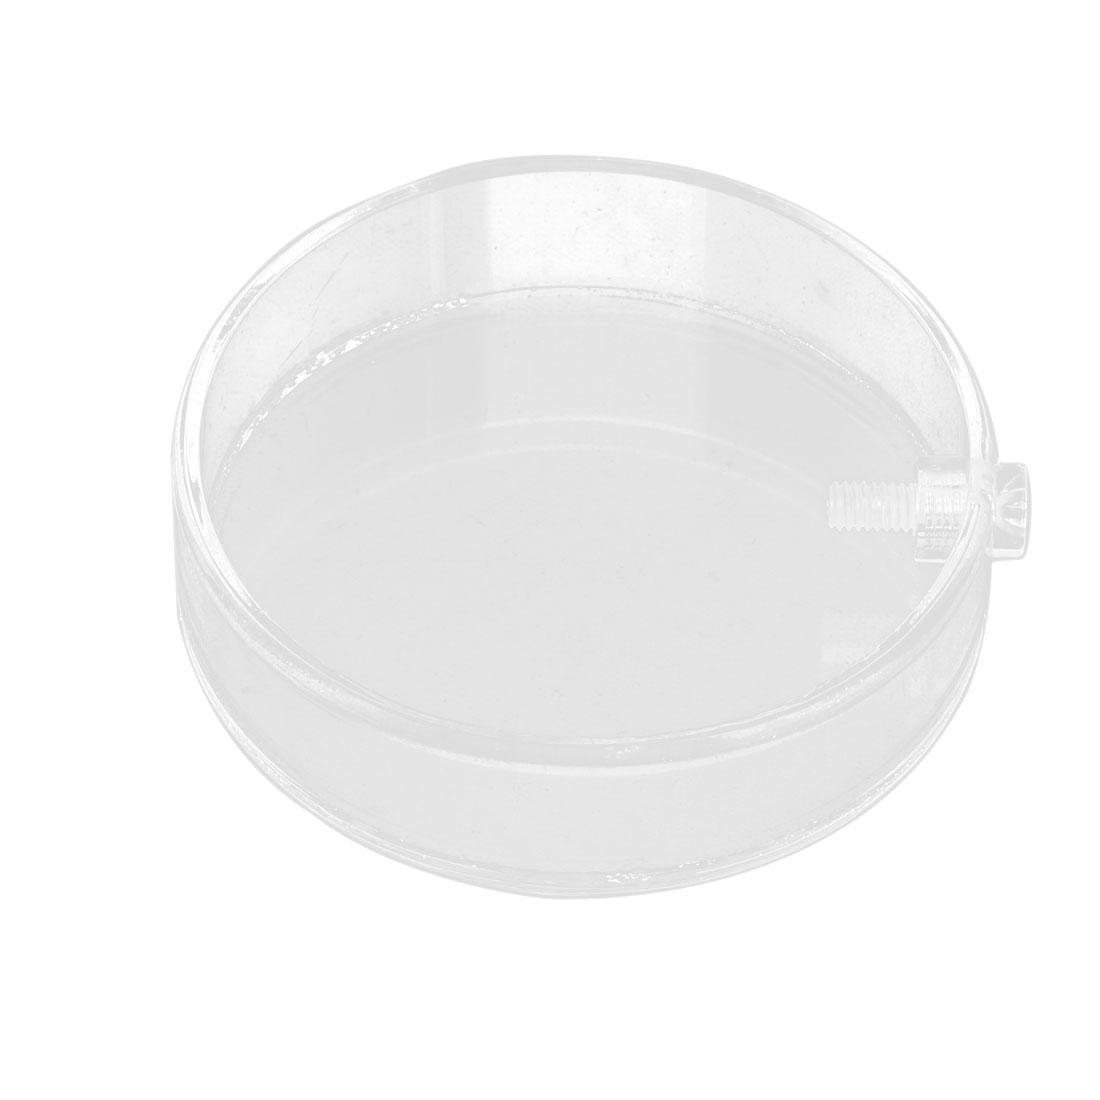 Aquarium Fish Tank Plastic Round Shaped Shrimp Feeding Dish Bowl Clear